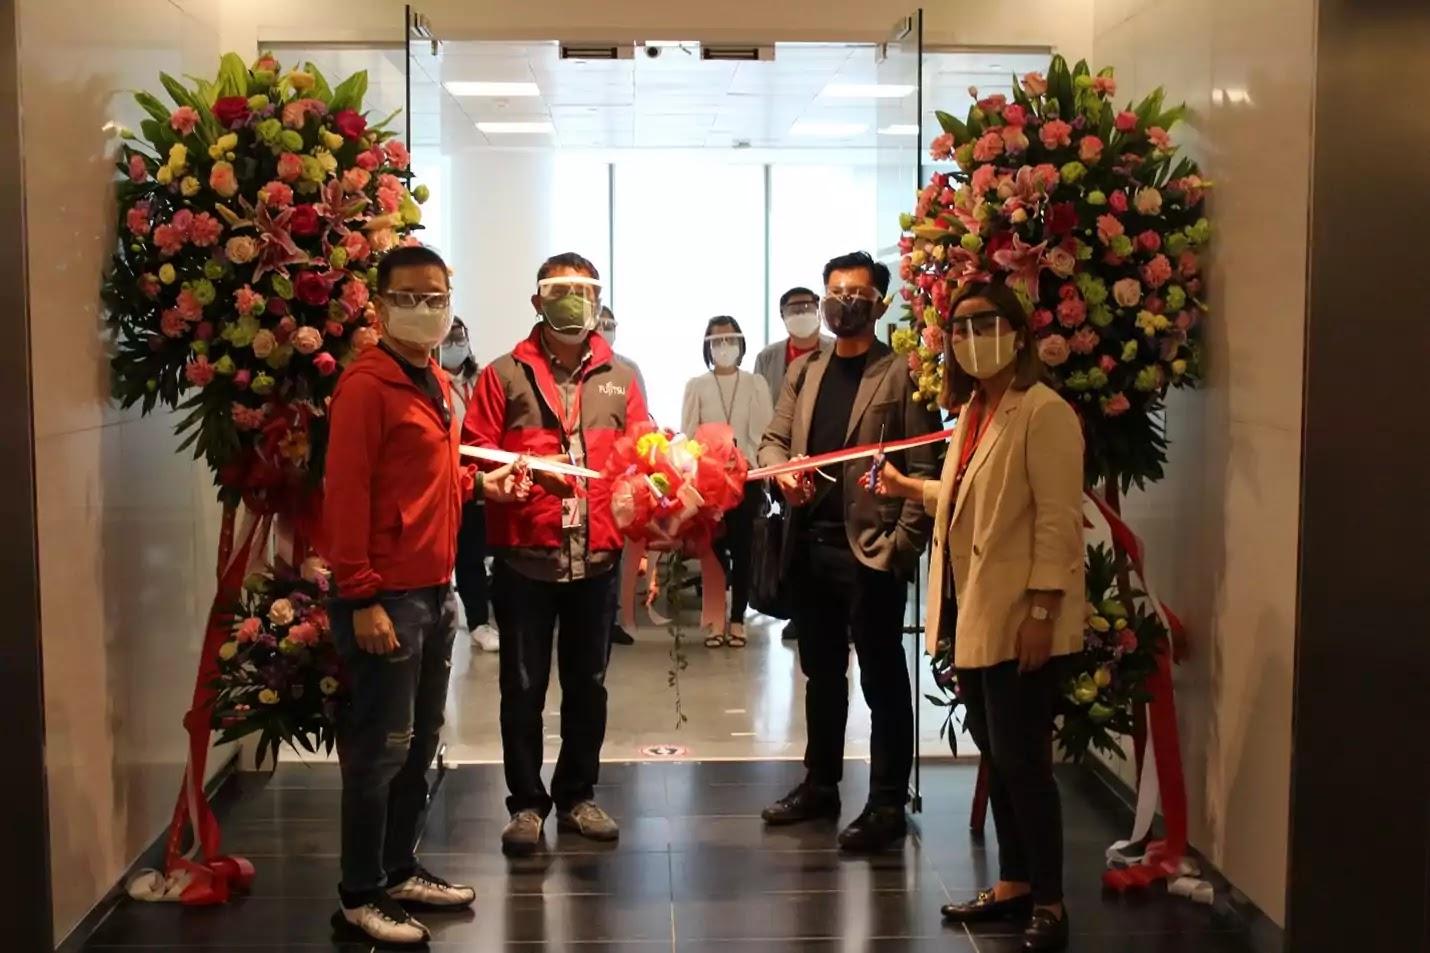 Fujitsu Philippines Modern HQ in Makati